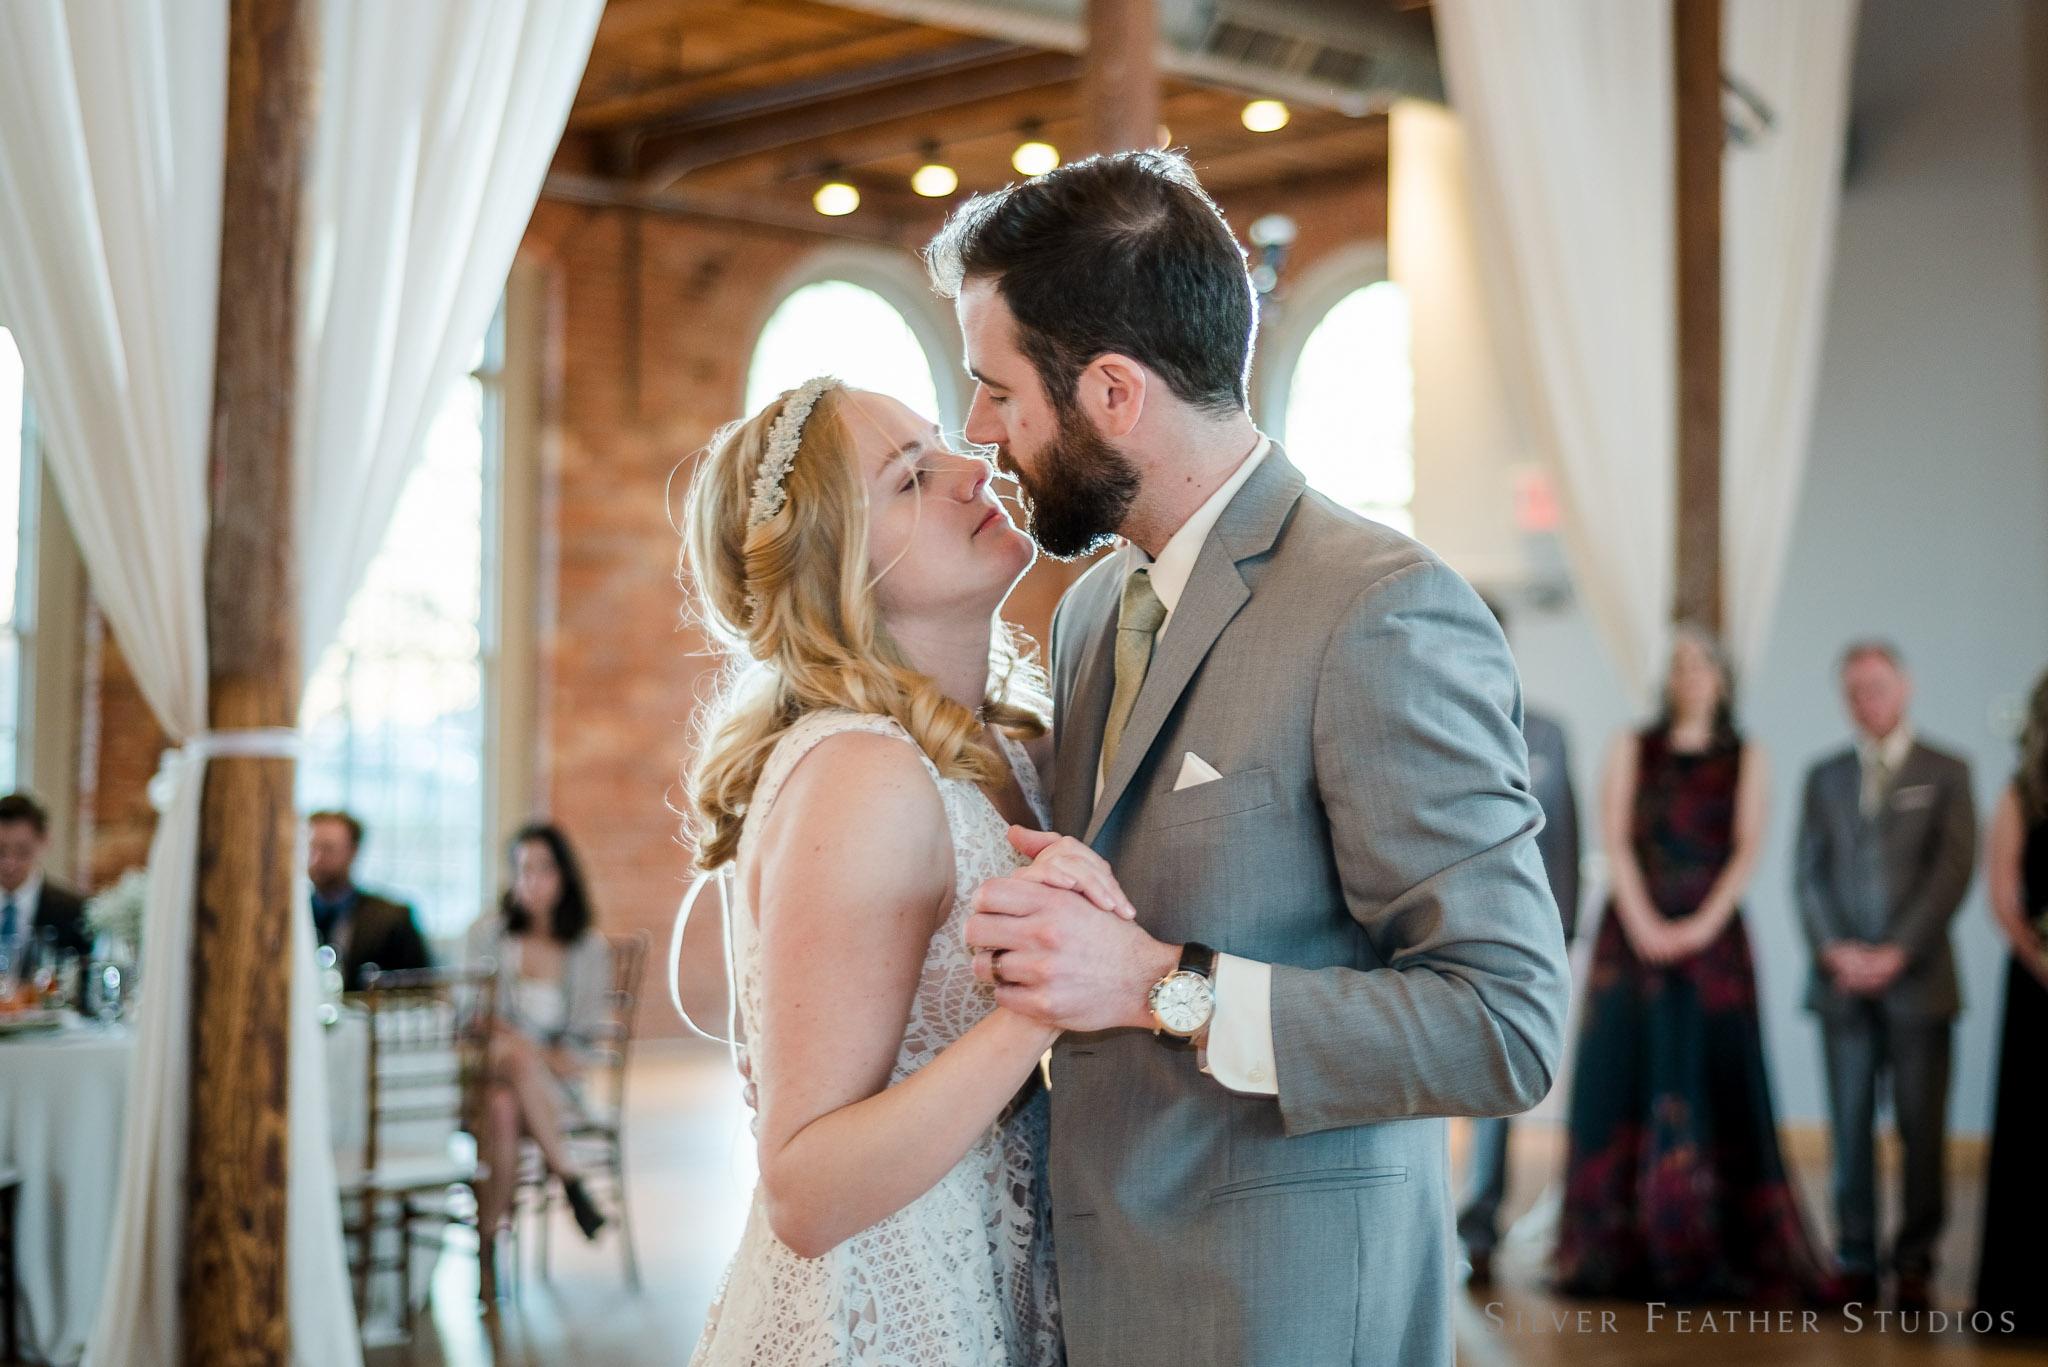 cotton-room-wedding-photography-057.jpg